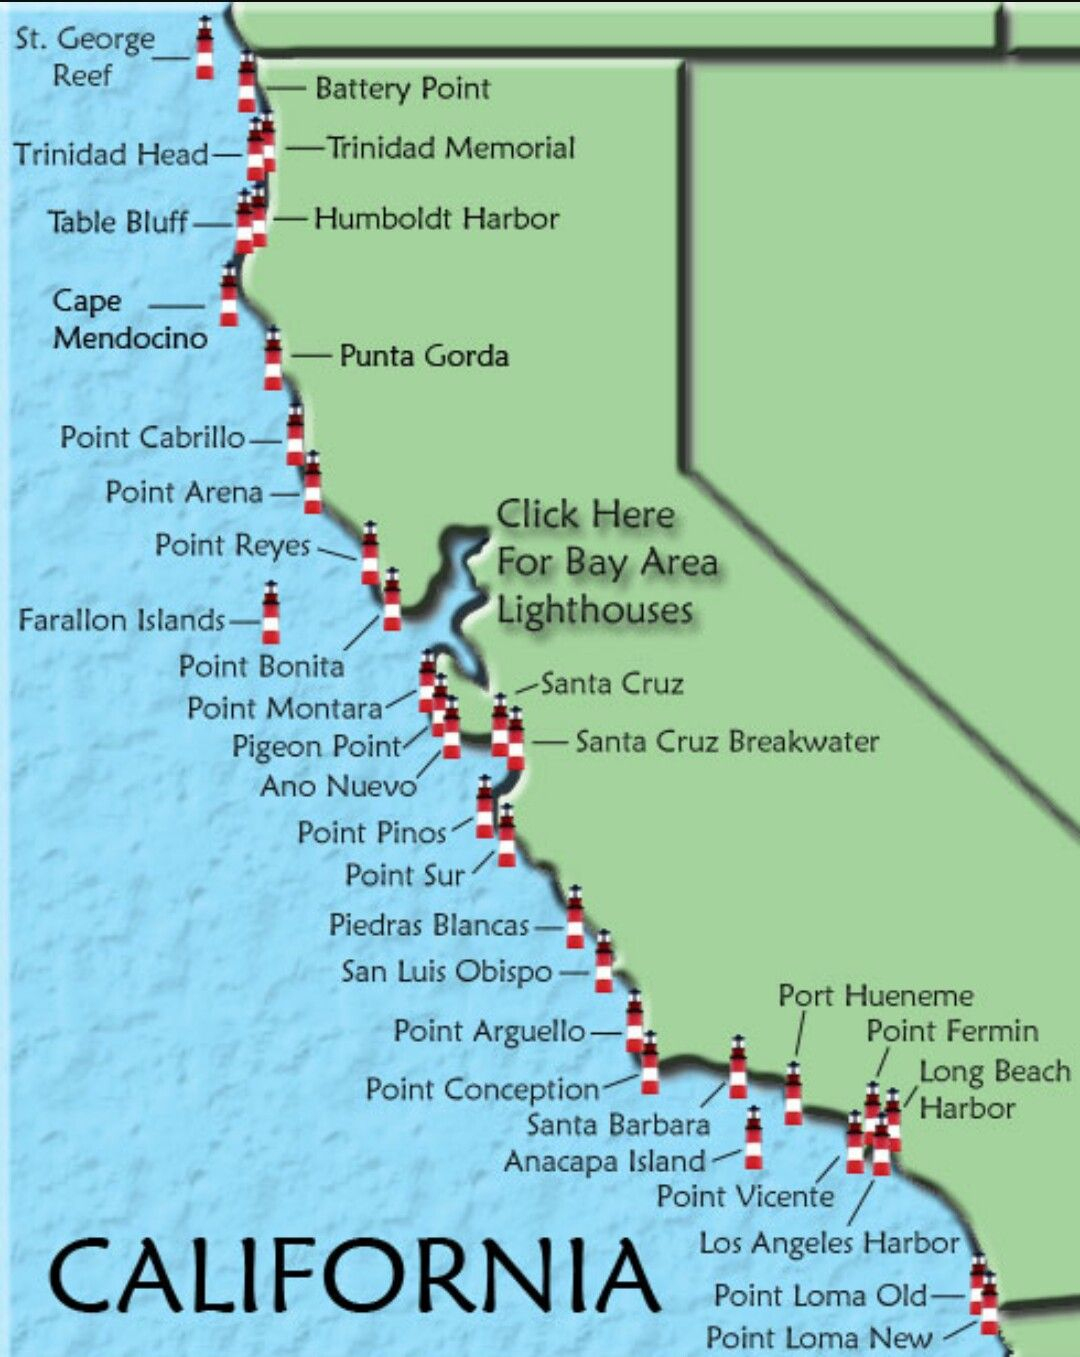 Cfcedabadcfeb Valid Map Of Northern California Beaches Map - Klipy - Northern California Beaches Map